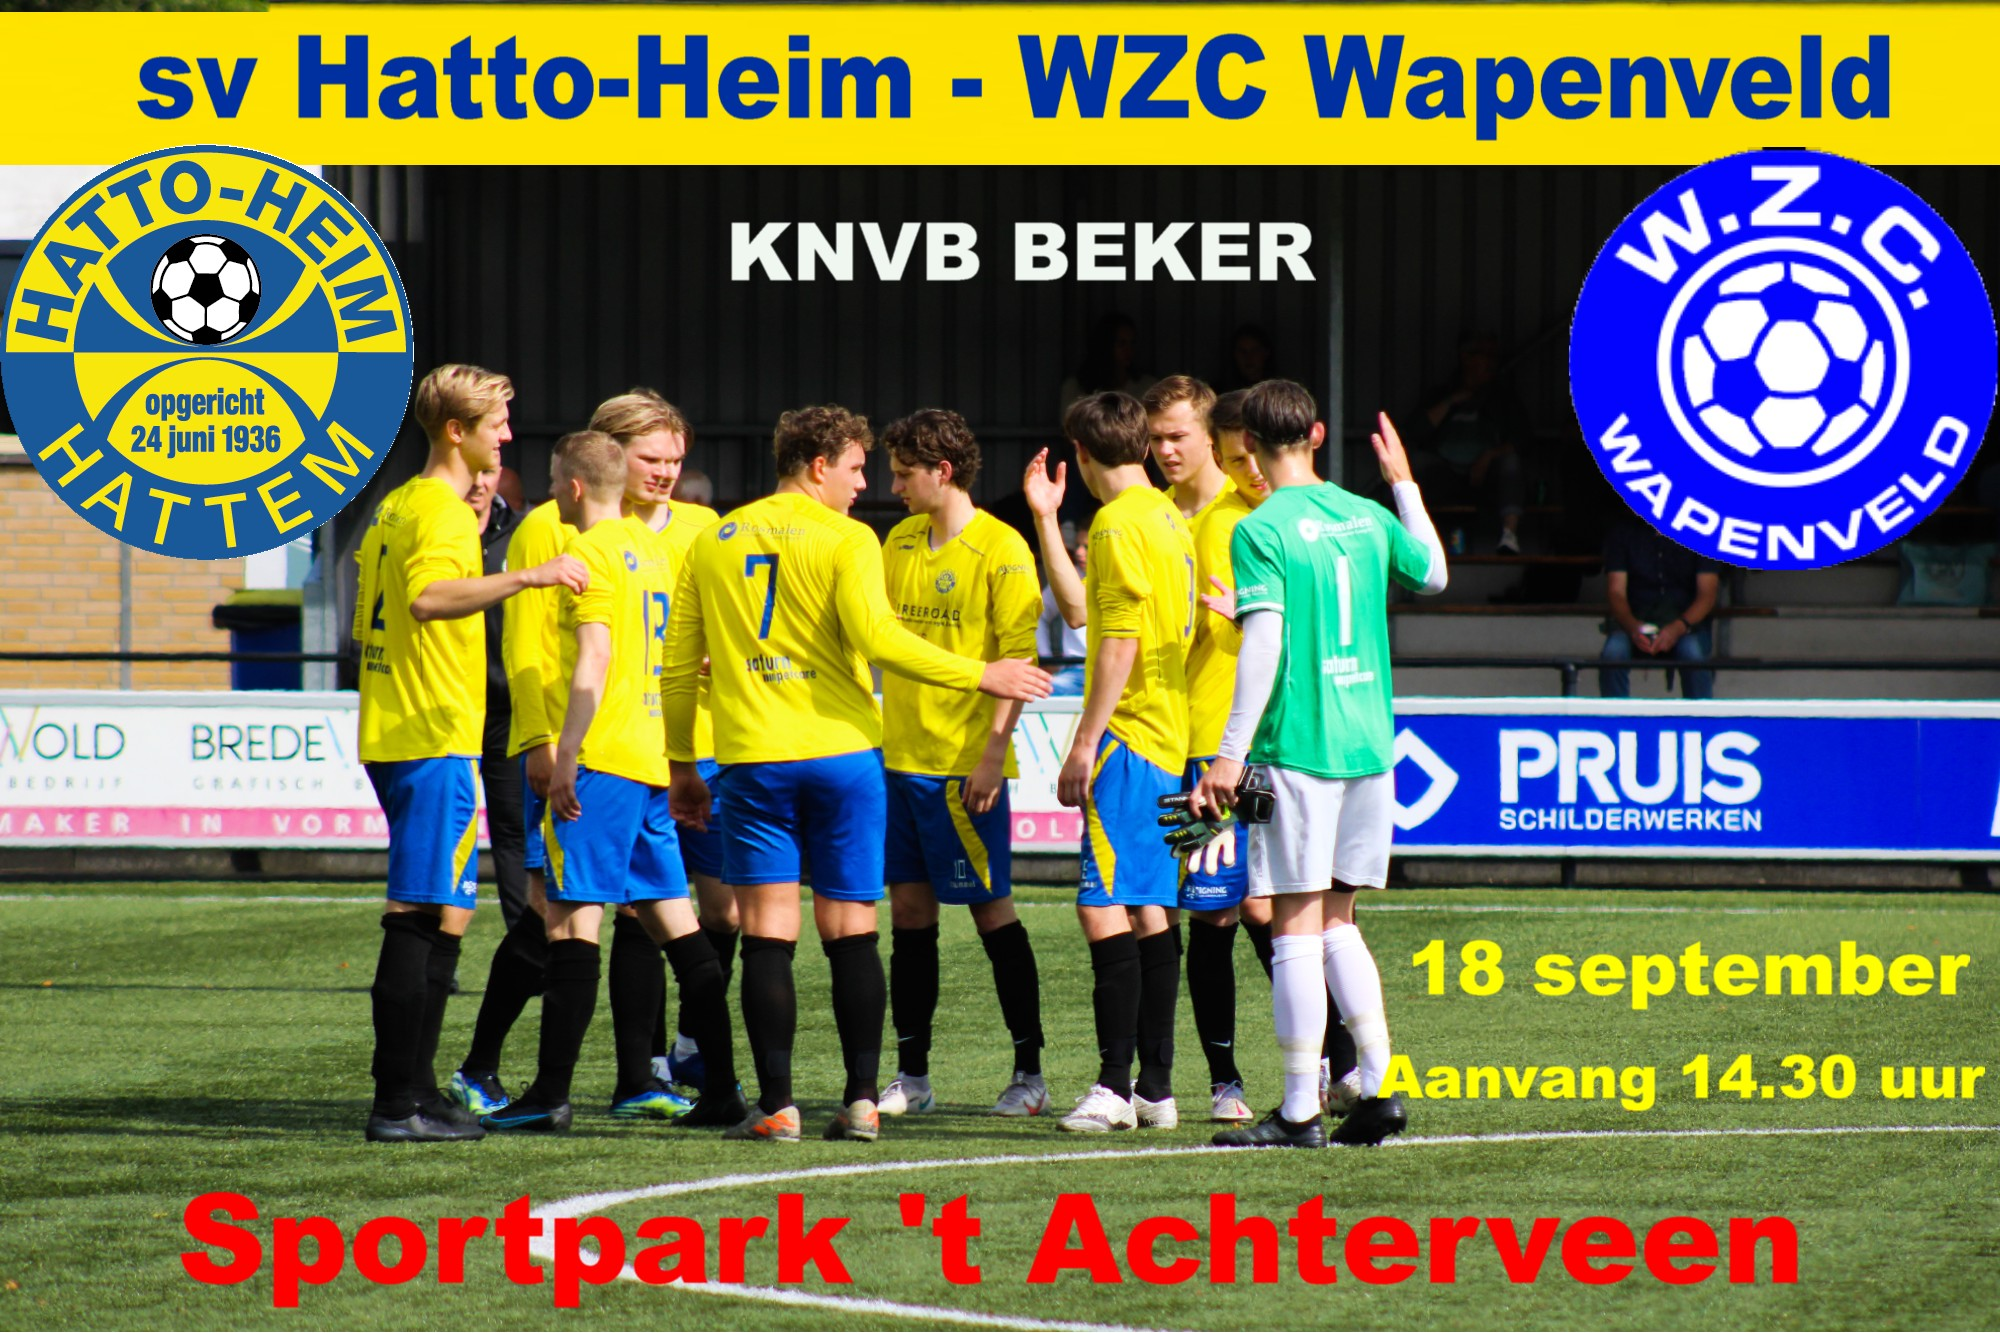 sv Hatto-Heim - WZC Wapenveld (bekerwedstrijd)